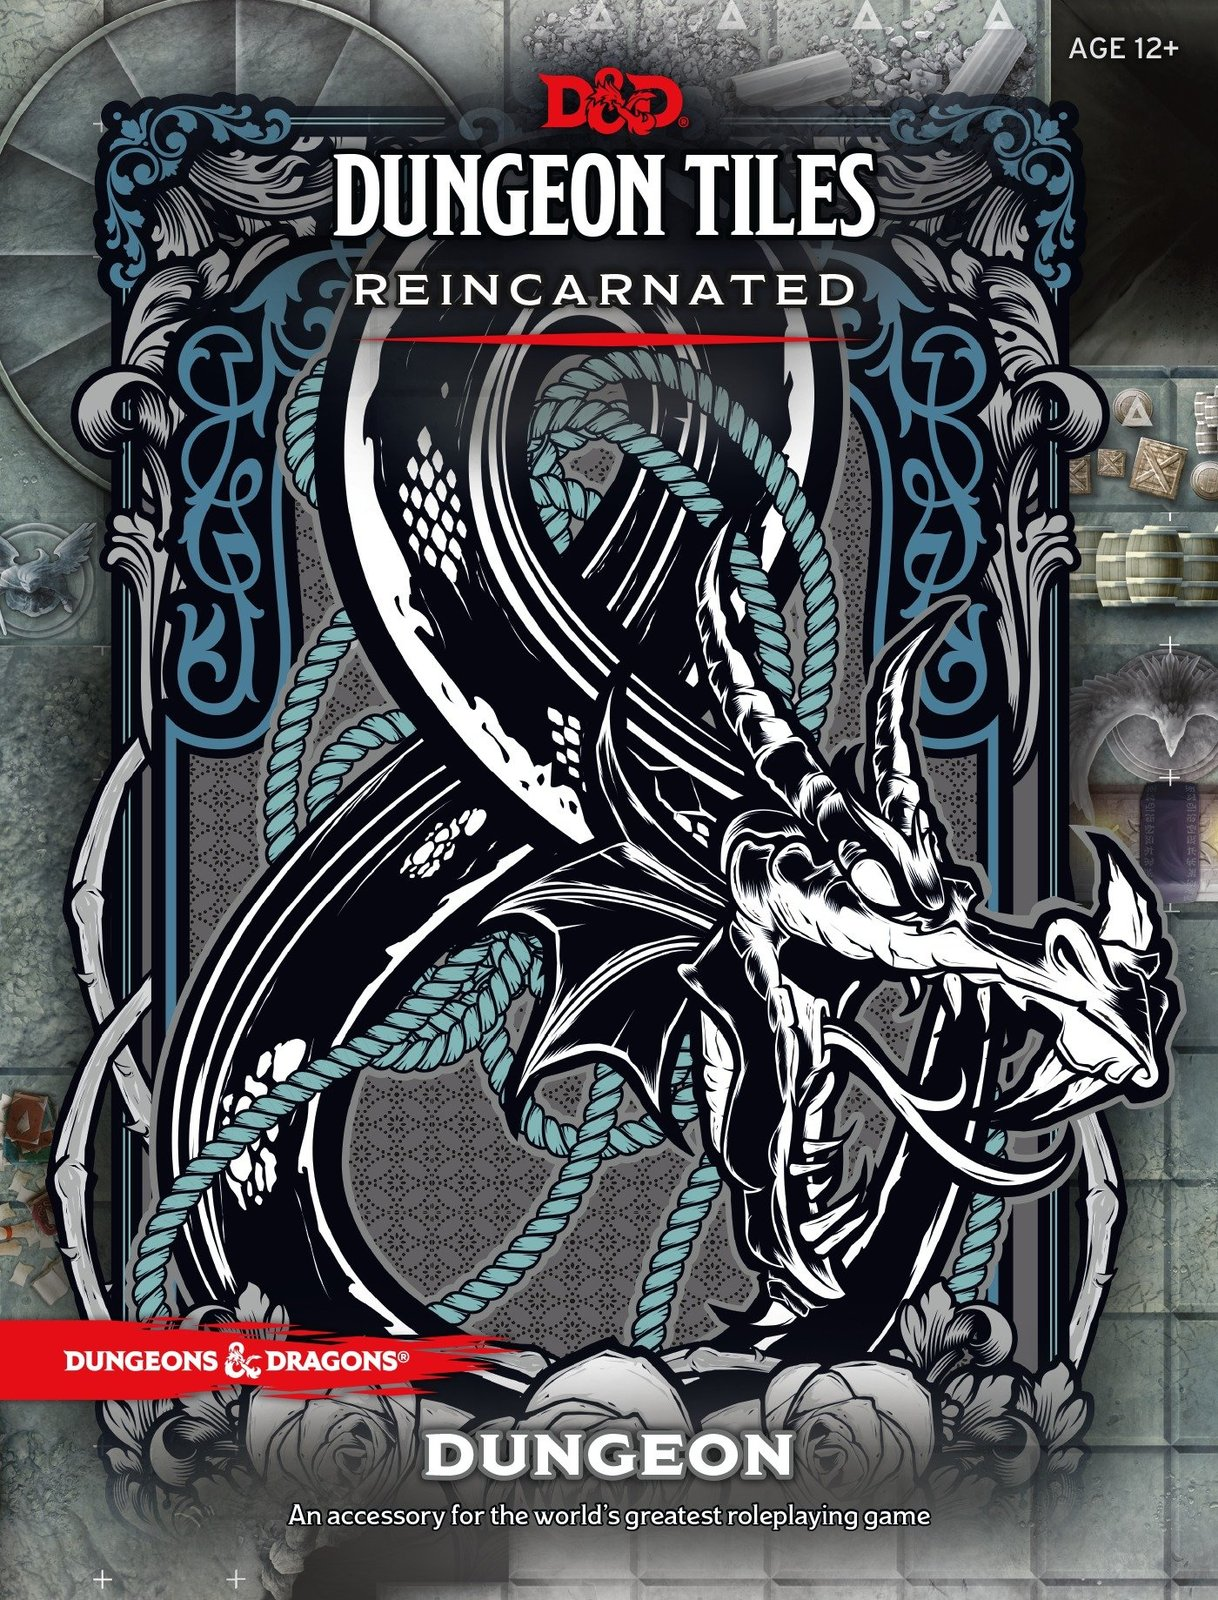 D&D: Dungeon Tiles Reincarnated: Dungeon image